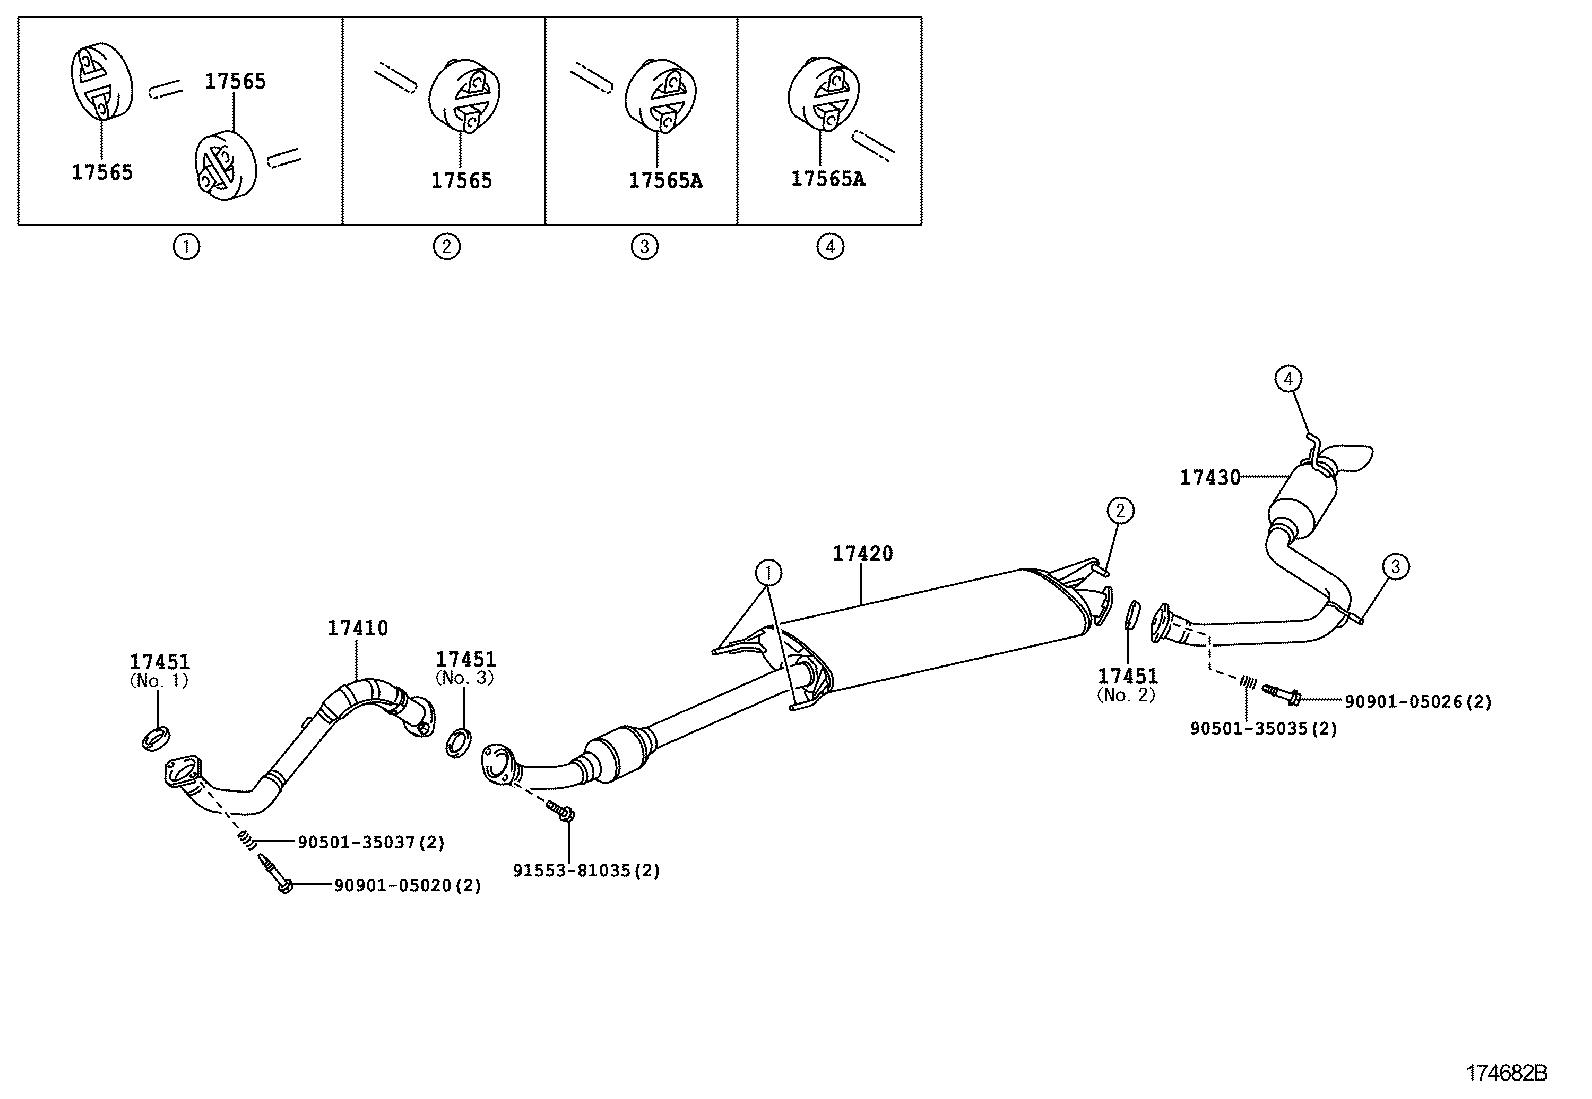 Rav4 Engineering Diagram - Wiring Diagram